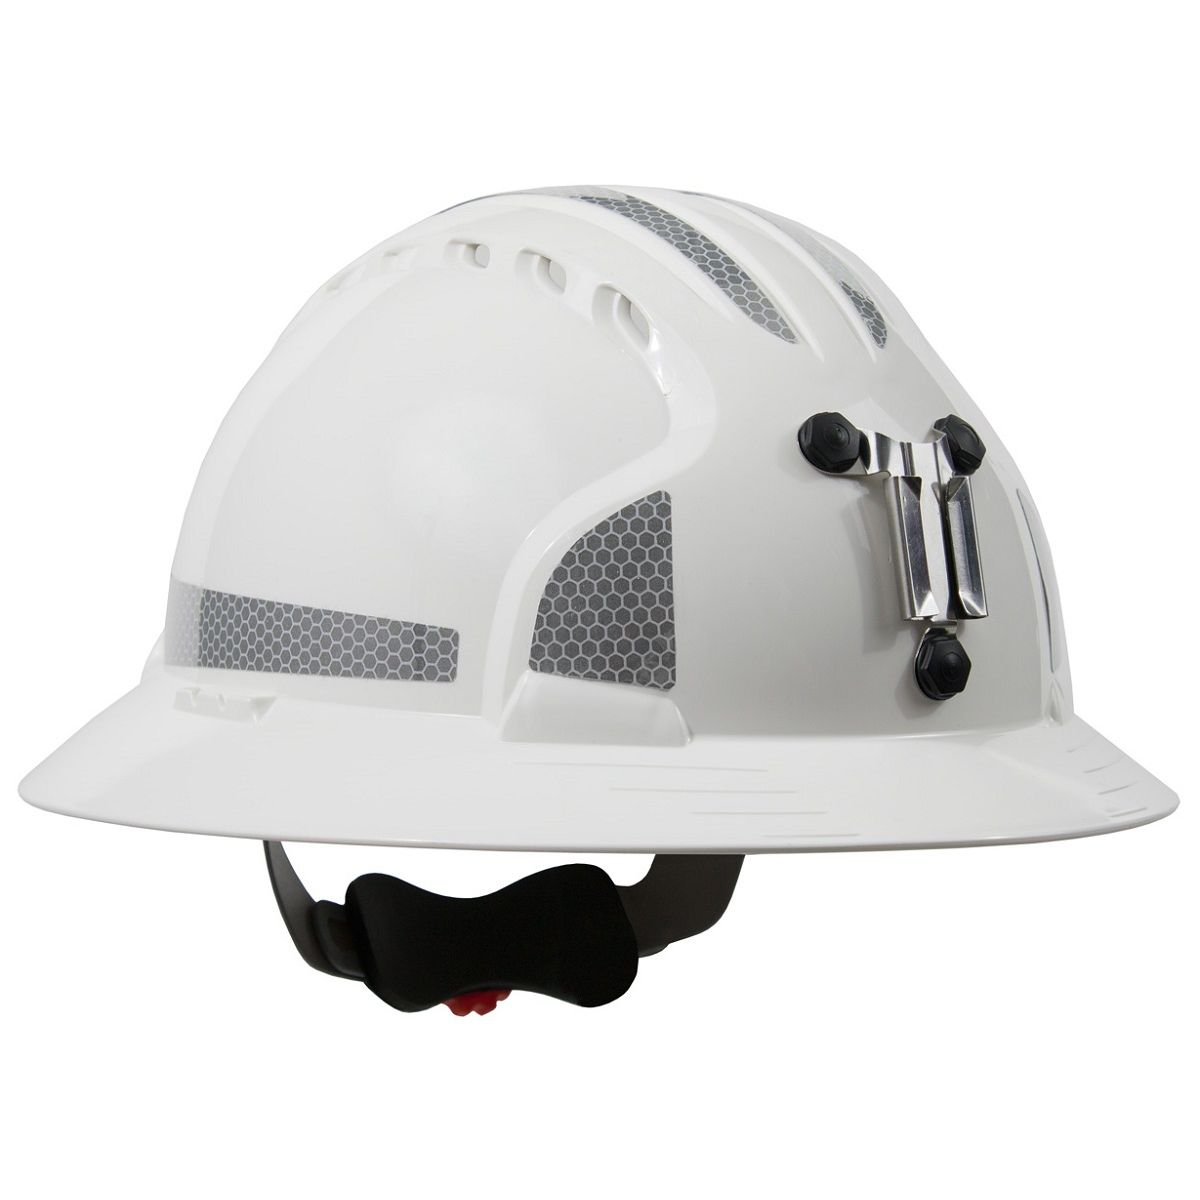 Jsp Evolution 6161mcr2 Deluxe Full Brim Reflective Mining Hard Hat Wheel Ratchet Suspension White Hard Hats Hard Hat Hats